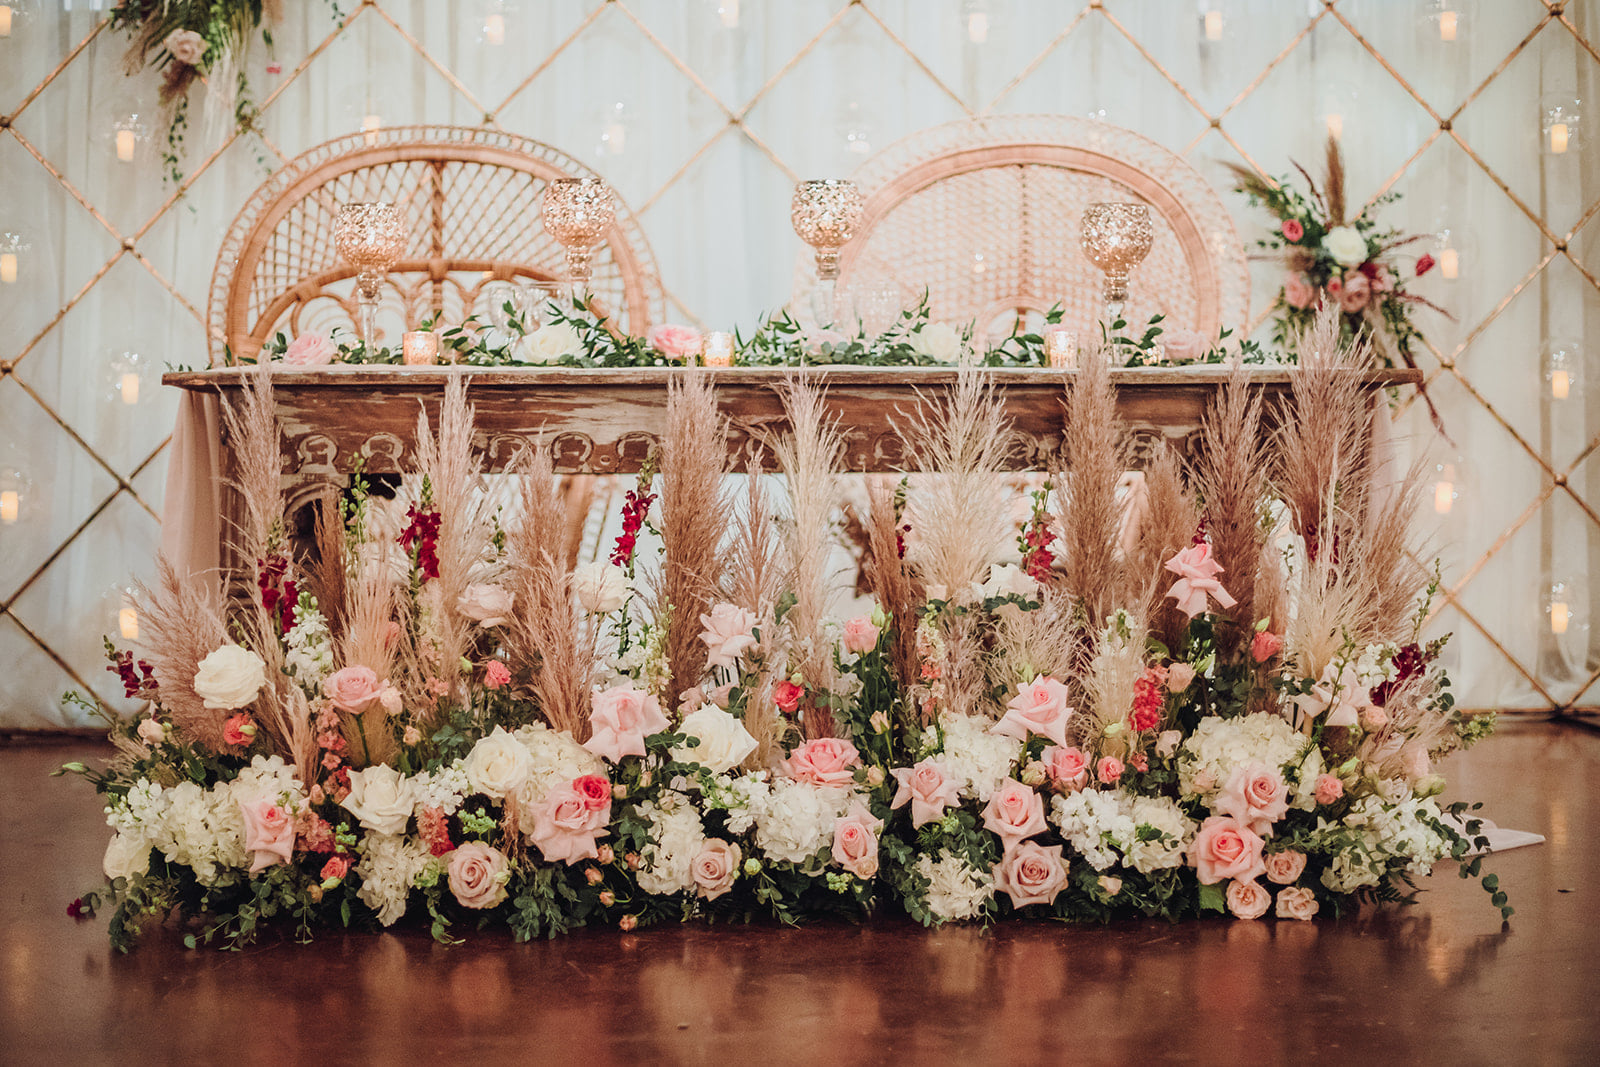 Sweetheart Table at Madera Estates in Conroe, Texas